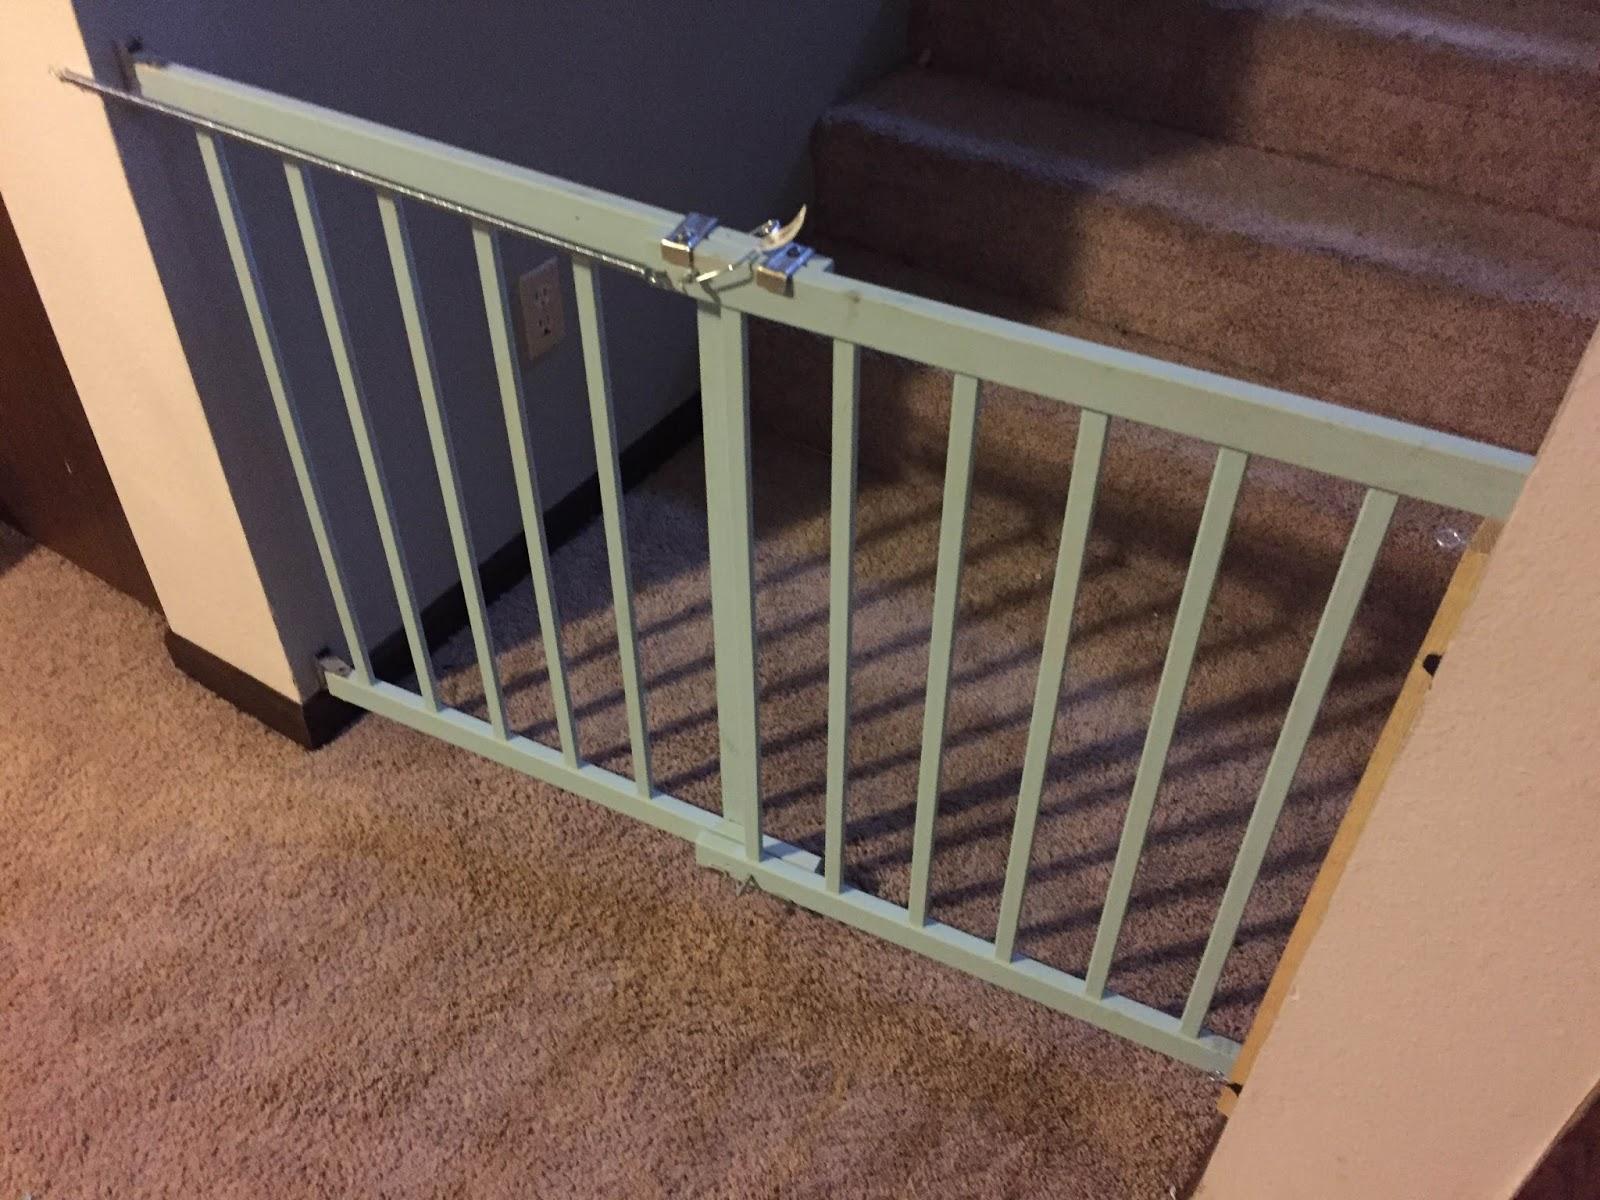 So, Hereu0027s How I Created A Self Closing Dog Gate.